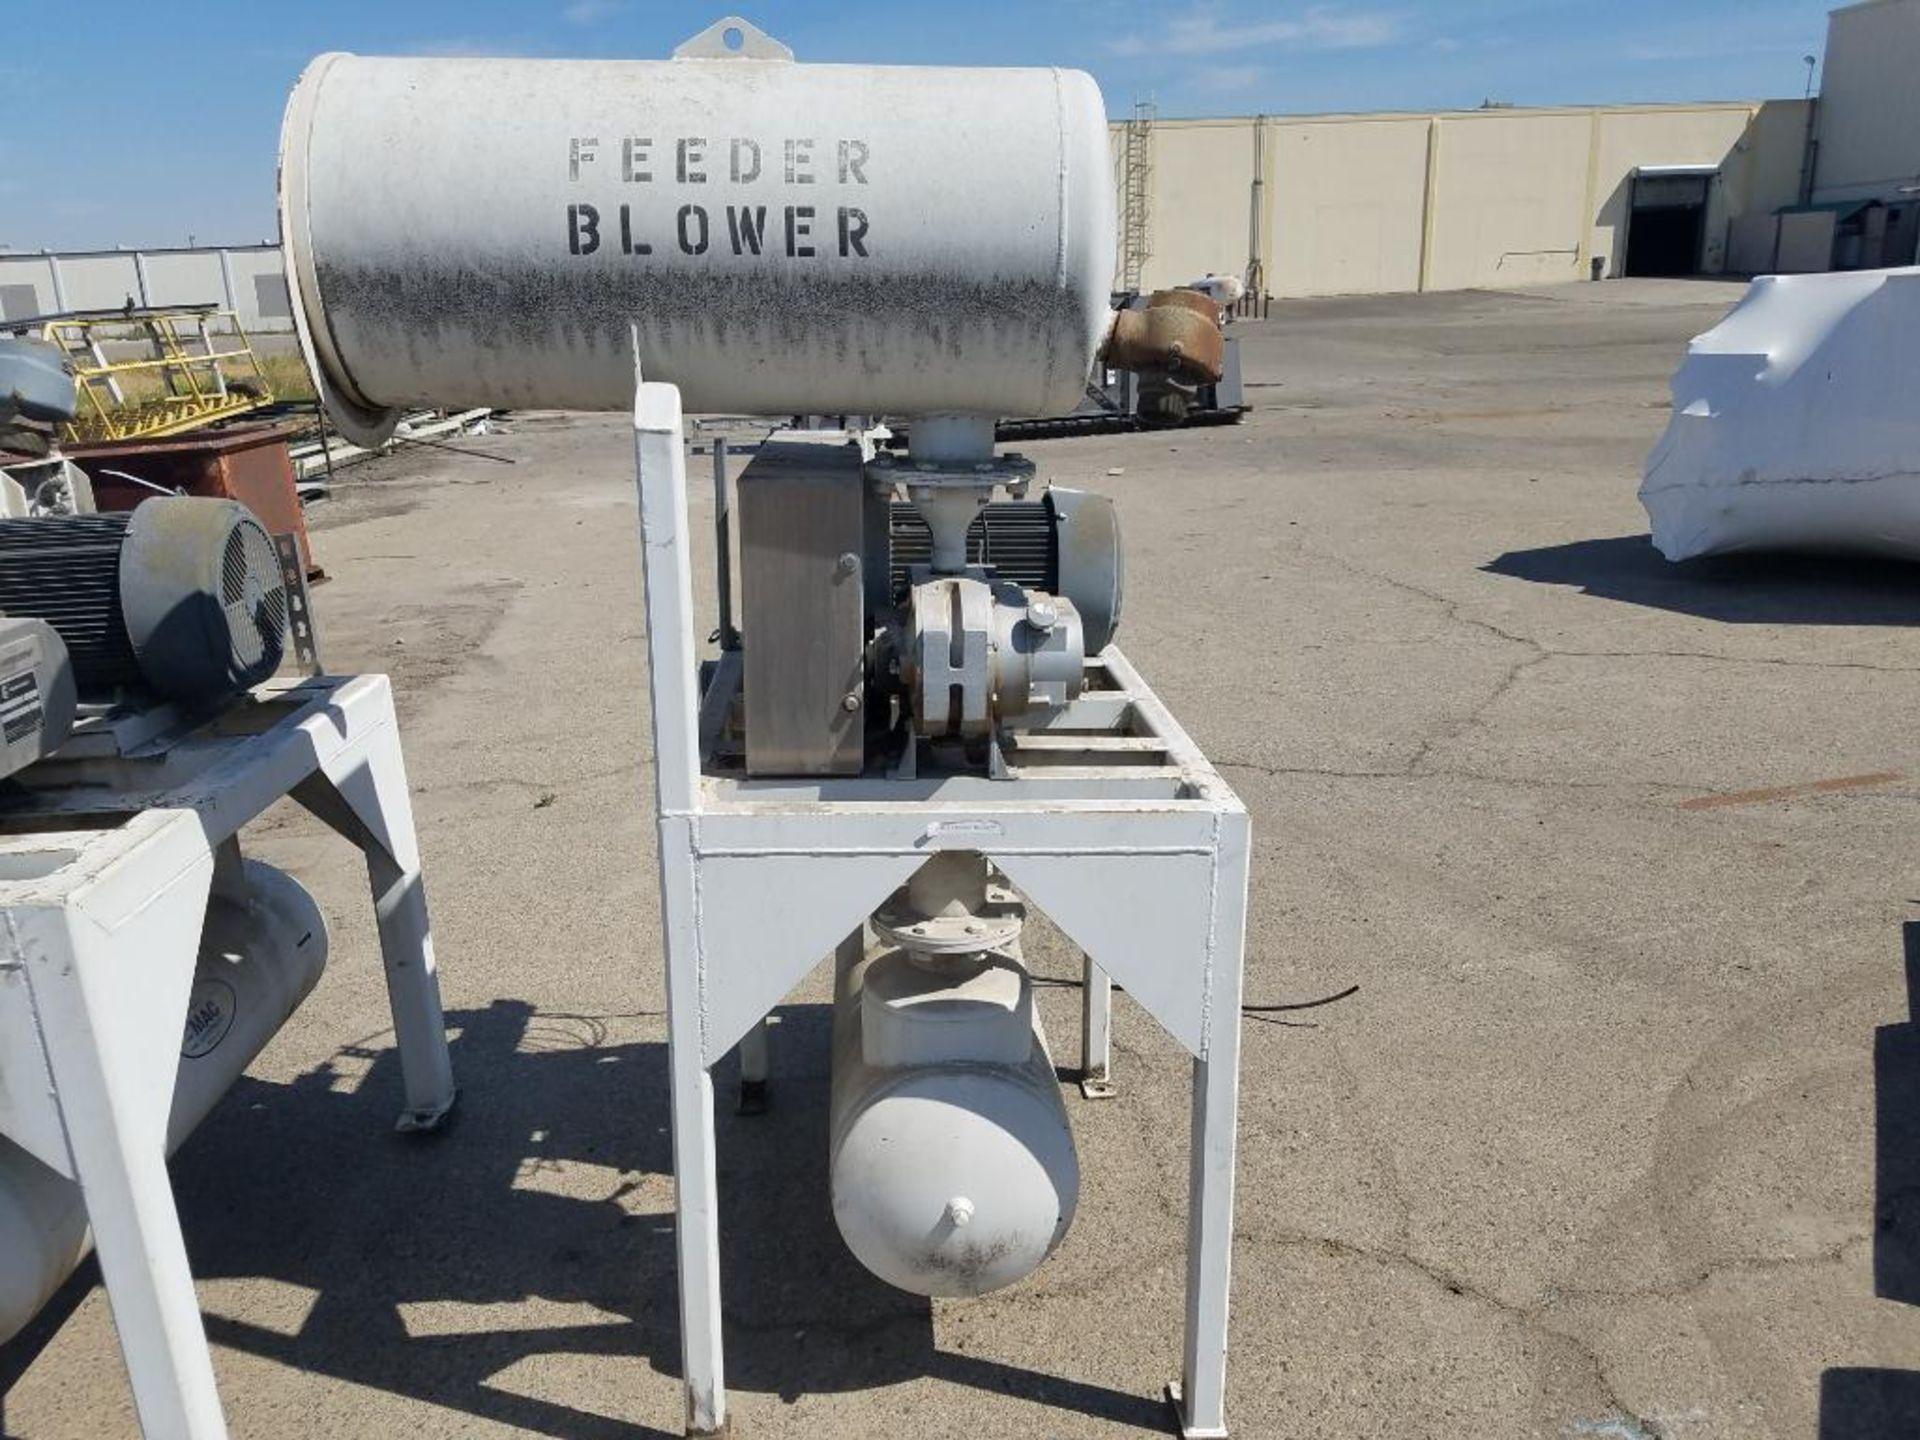 Sutorbilt rotary positive blower - Image 3 of 6